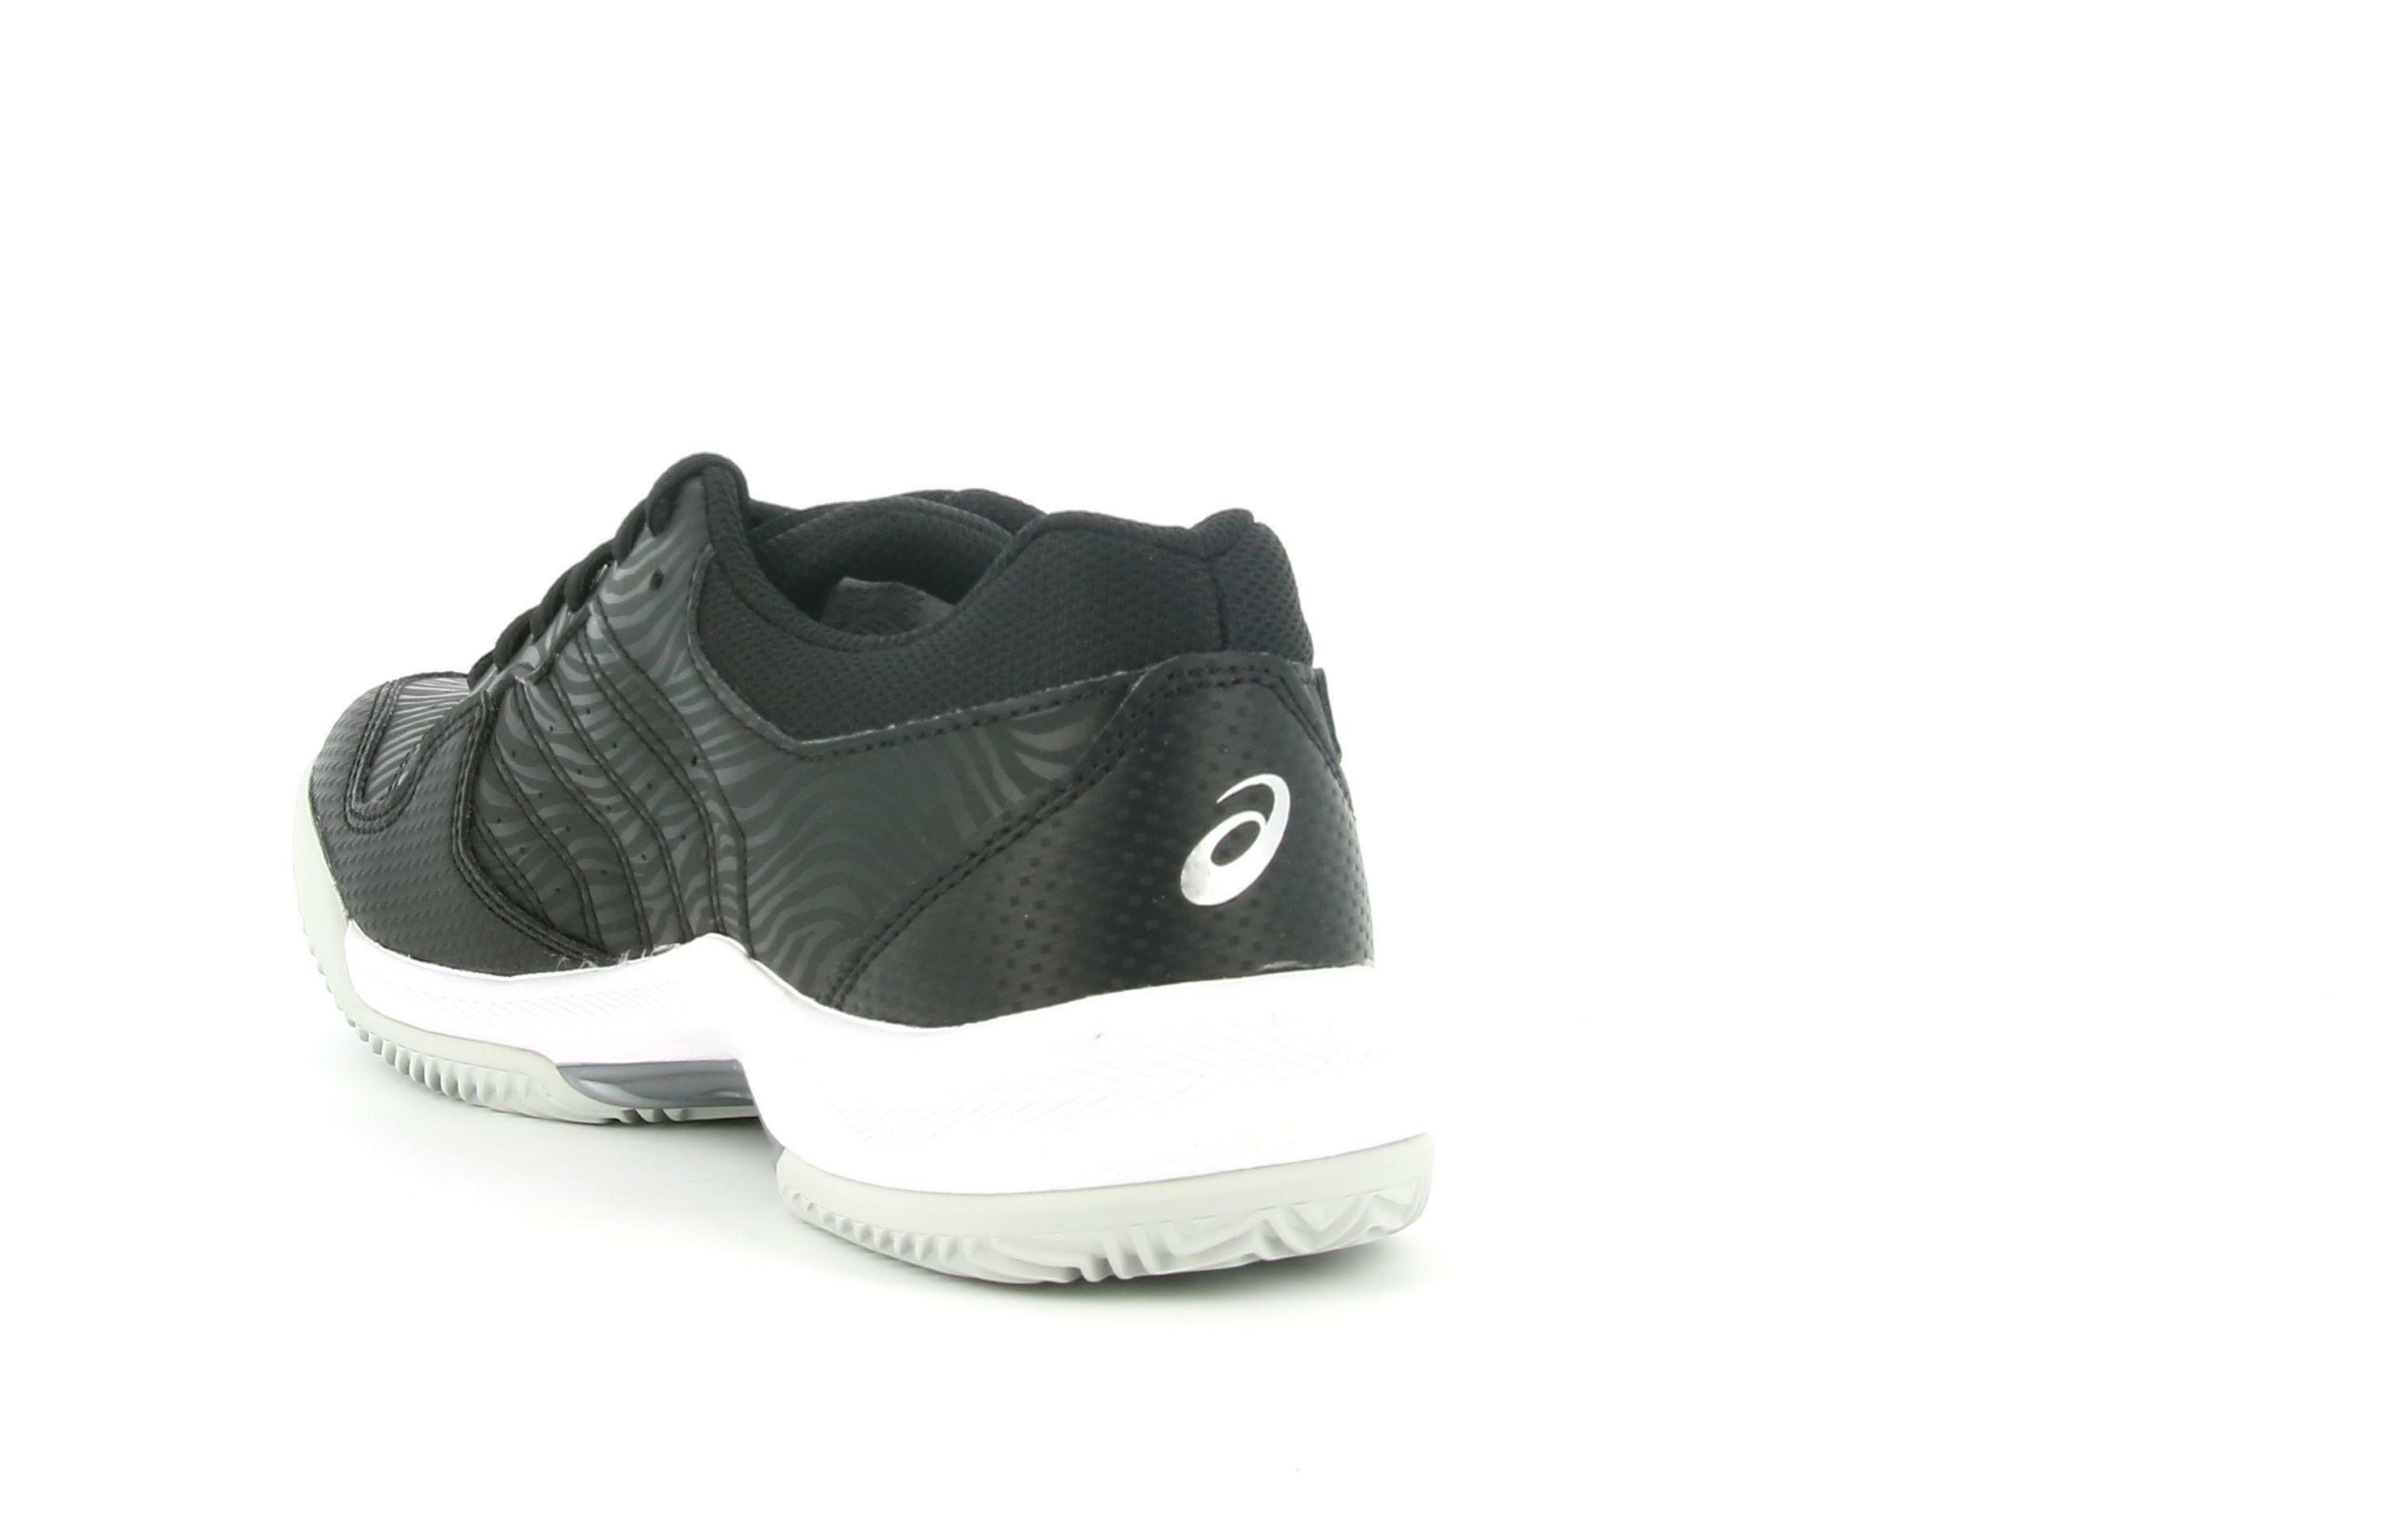 asics asics gel dedicate 6 clay 1042a073 scarpa sportiva da tennis unisex adulto nero